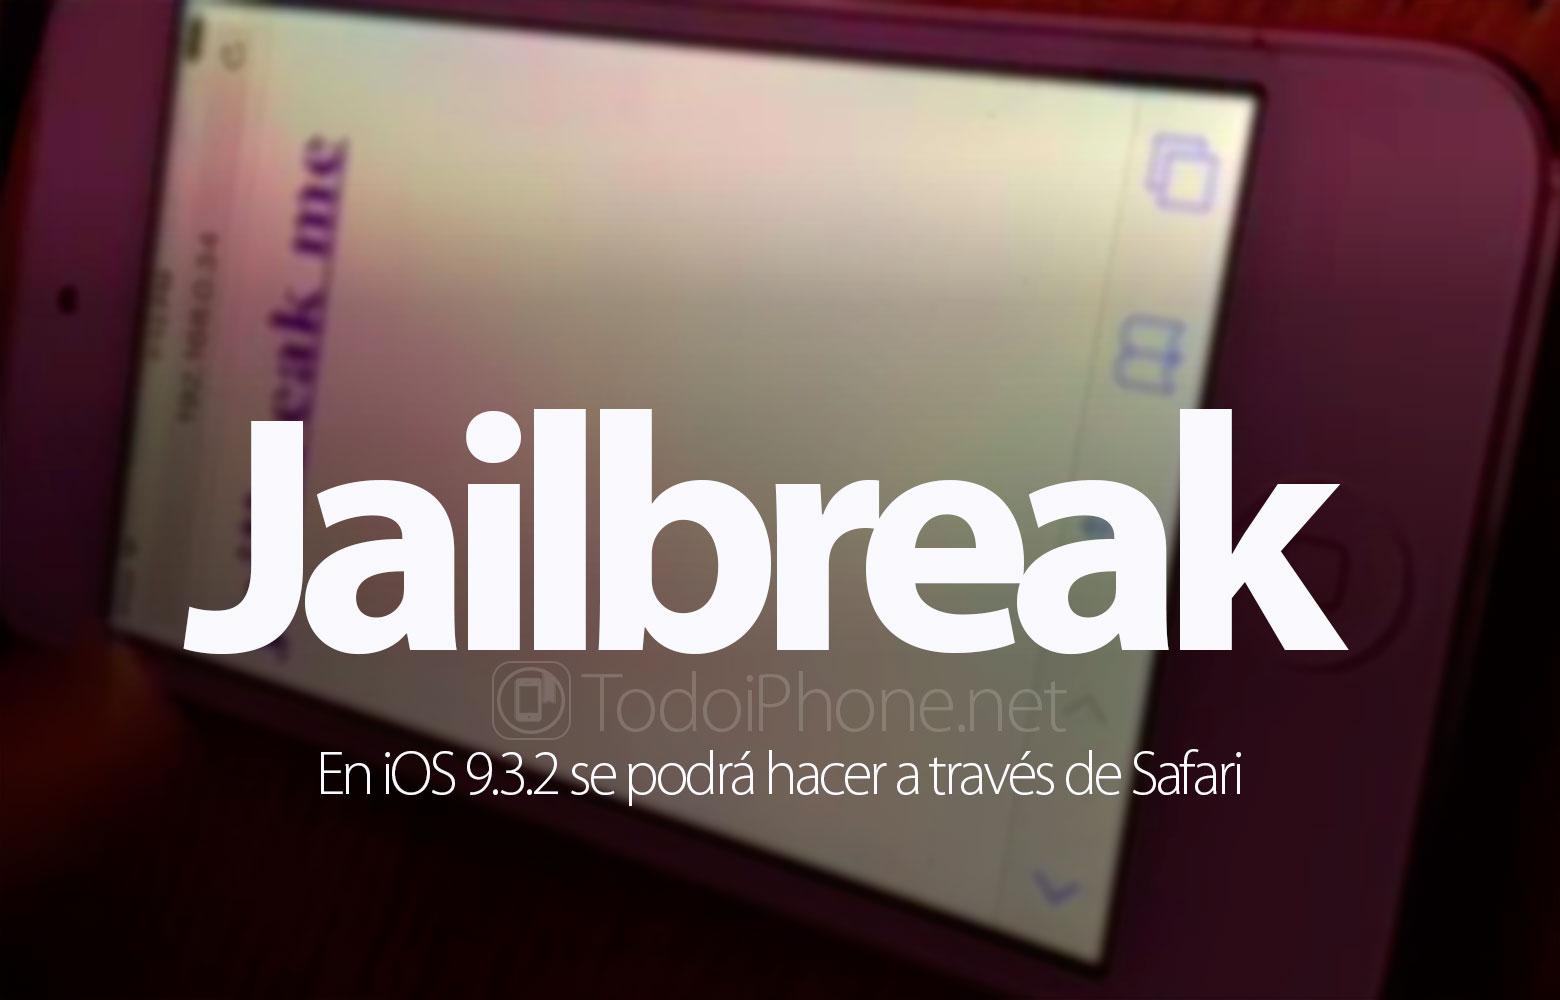 jailbreak-ios-9-3-2-podra-hacer-safari